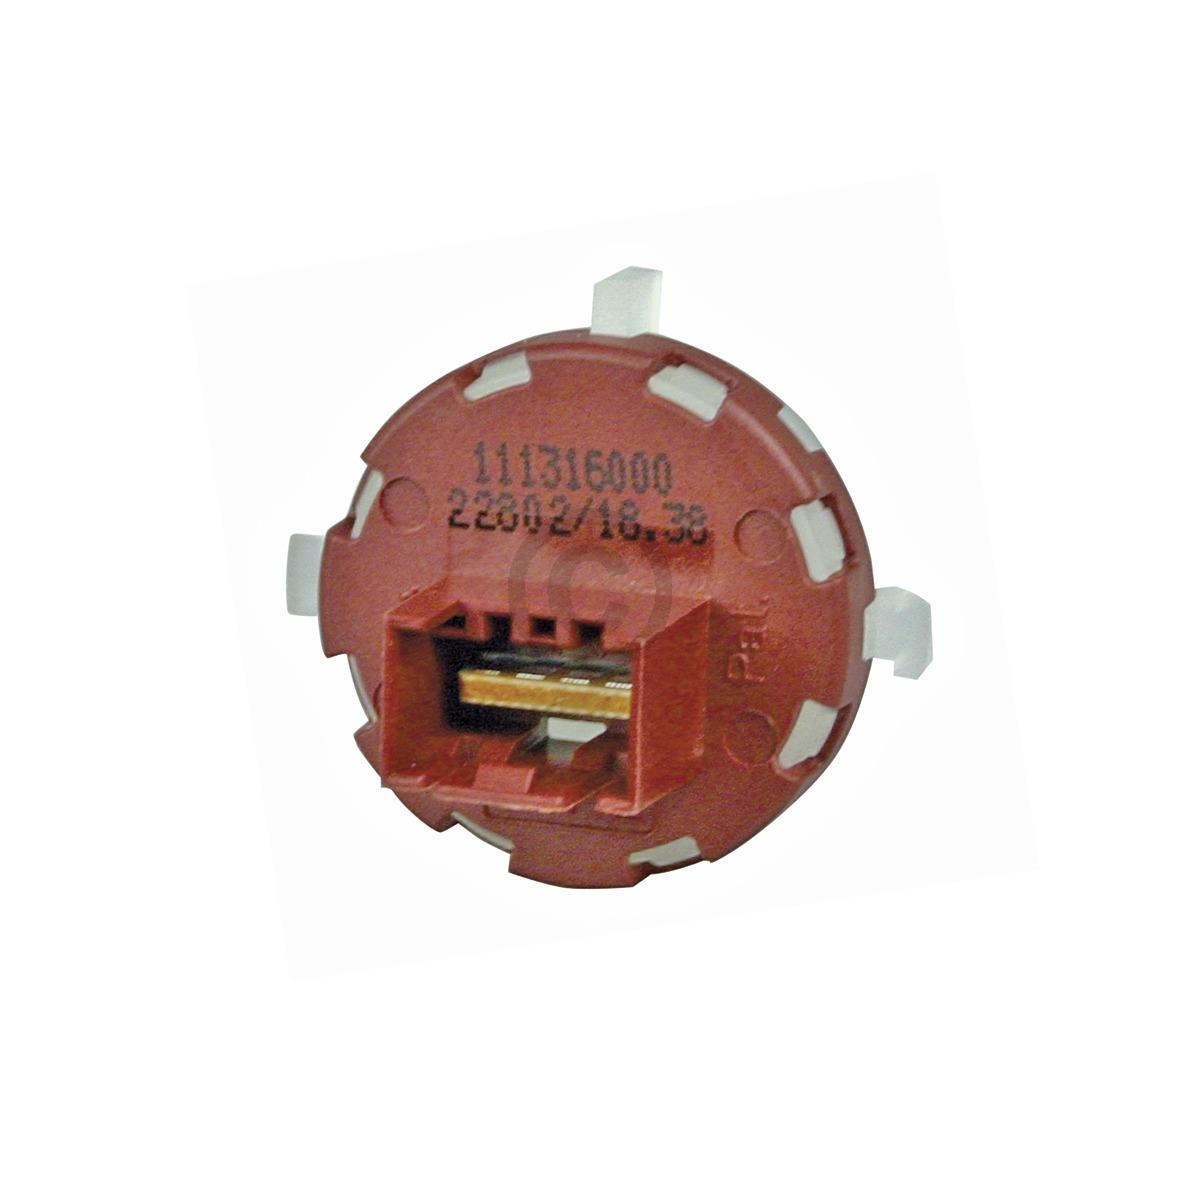 Temperaturfühler NTC 111316000 AEG, Electrolux, Juno, Zanussi